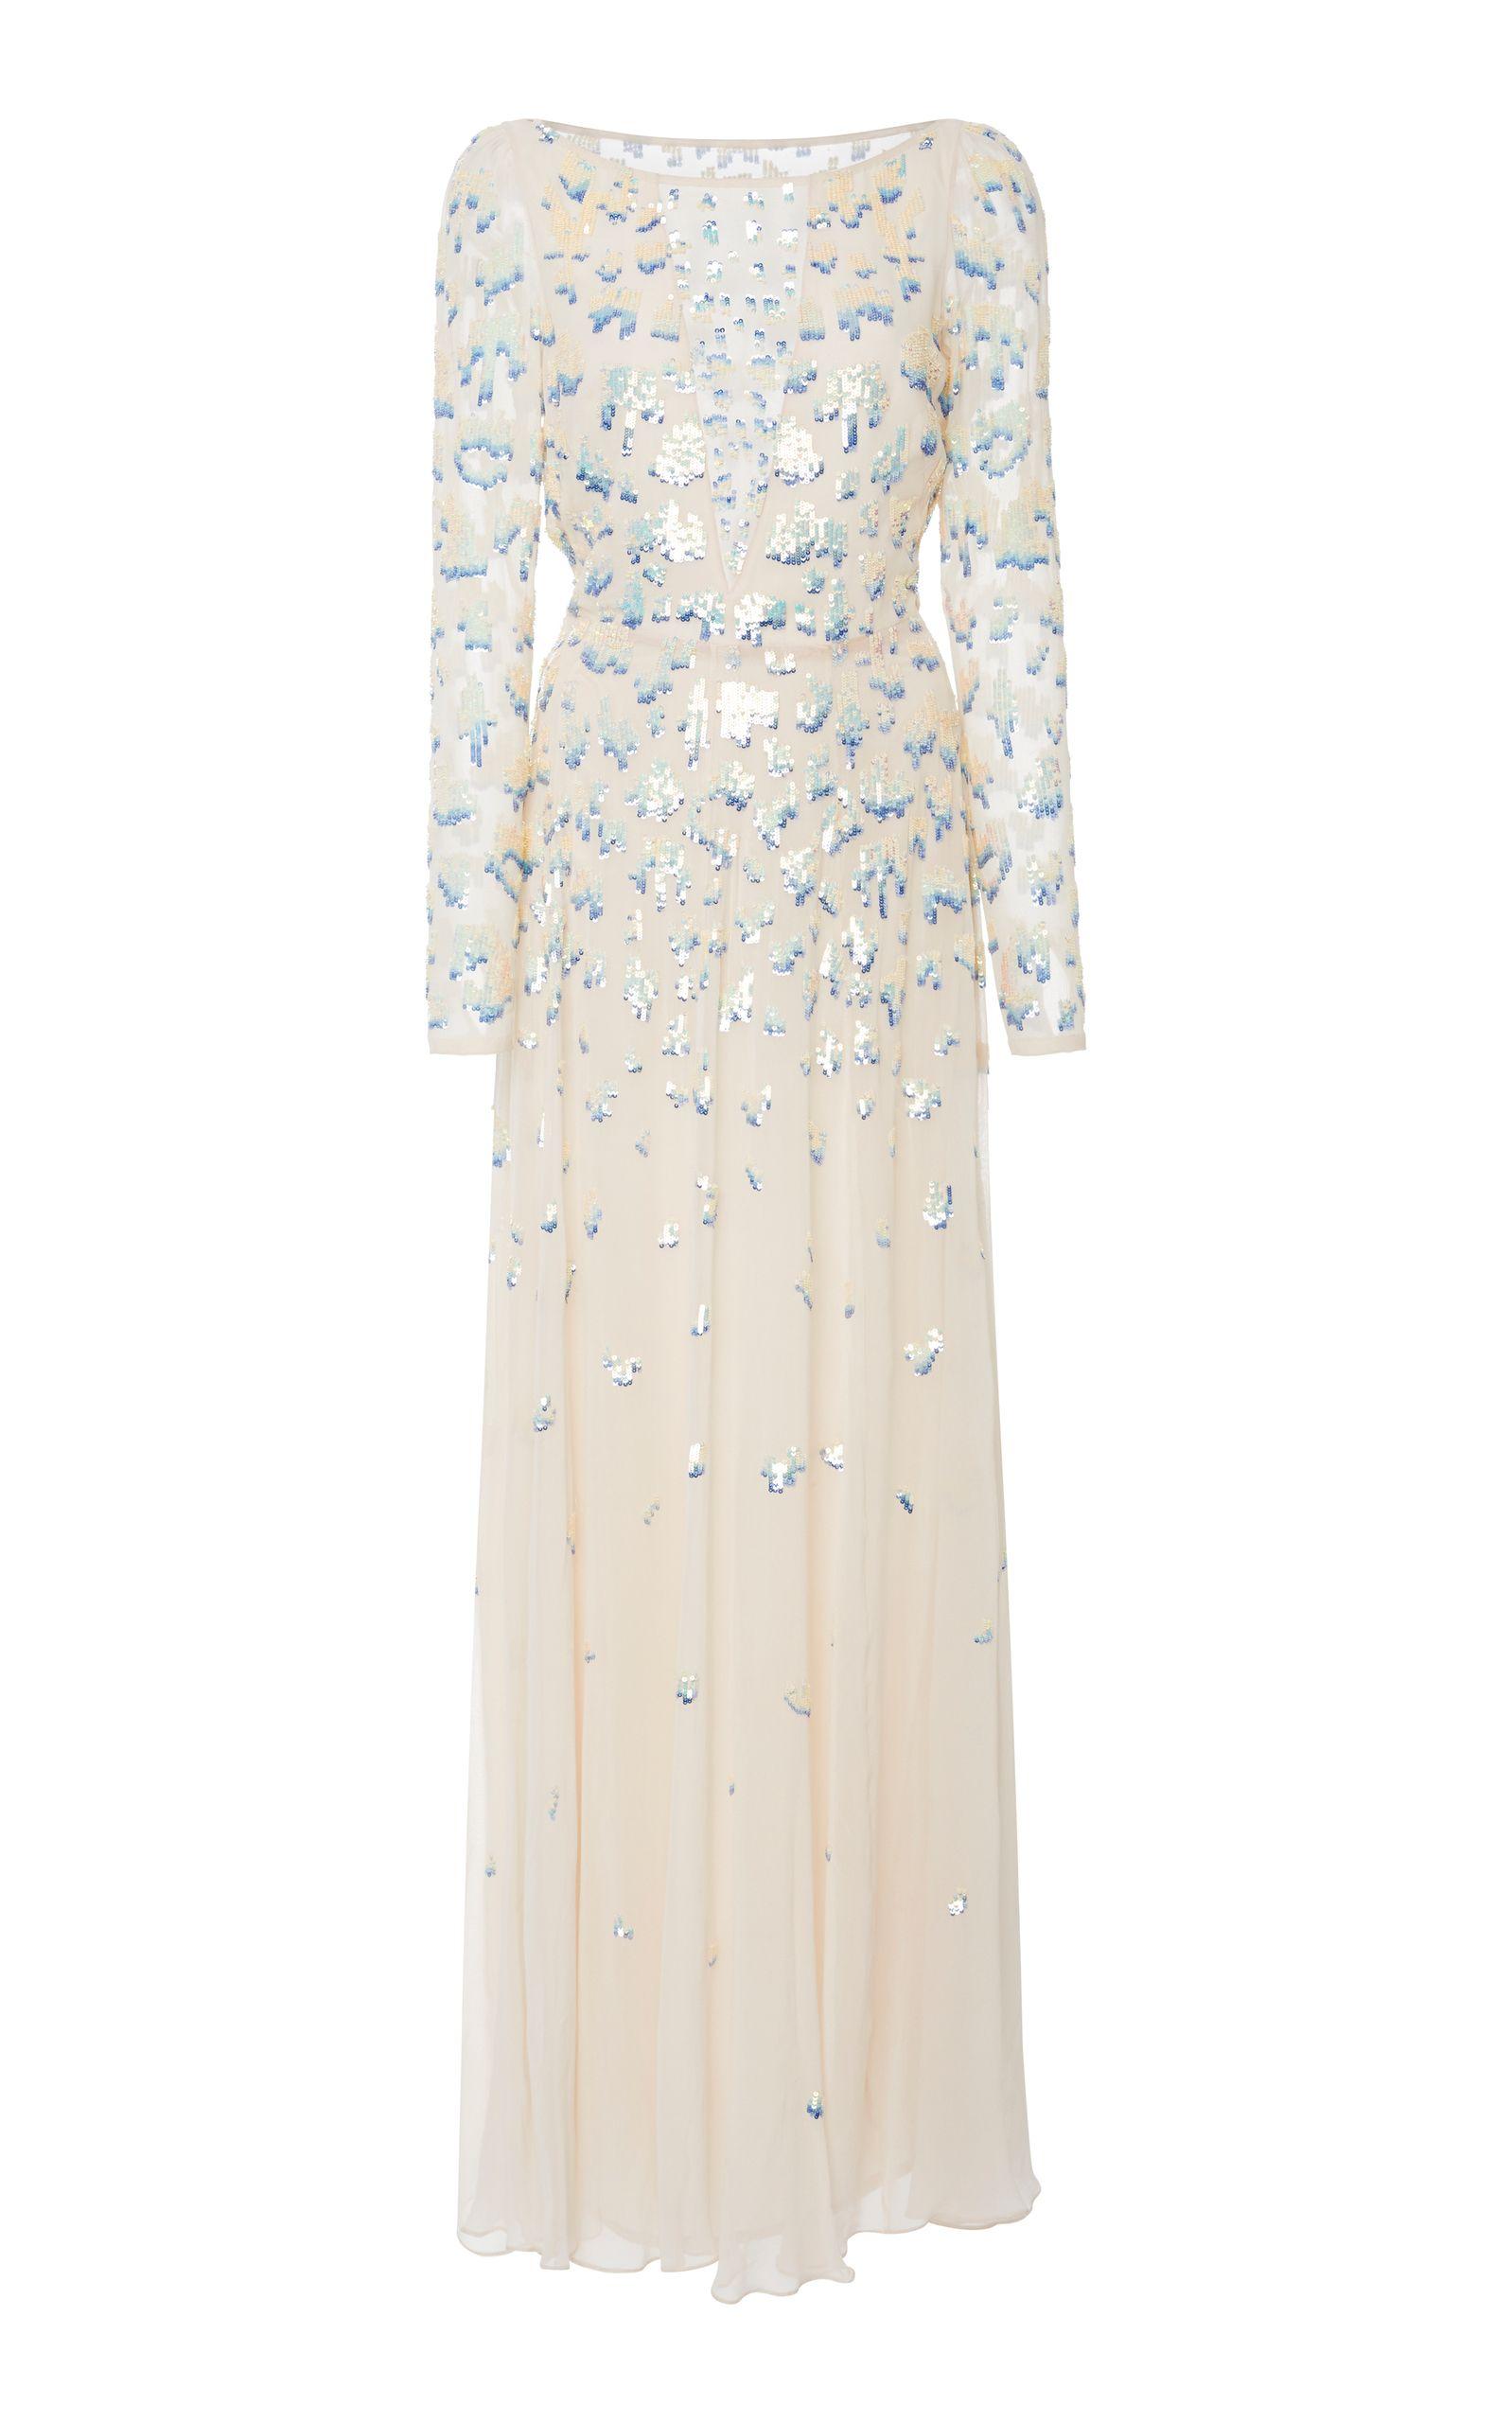 6f69373ad4cc Temperley London Celestial Long Dress